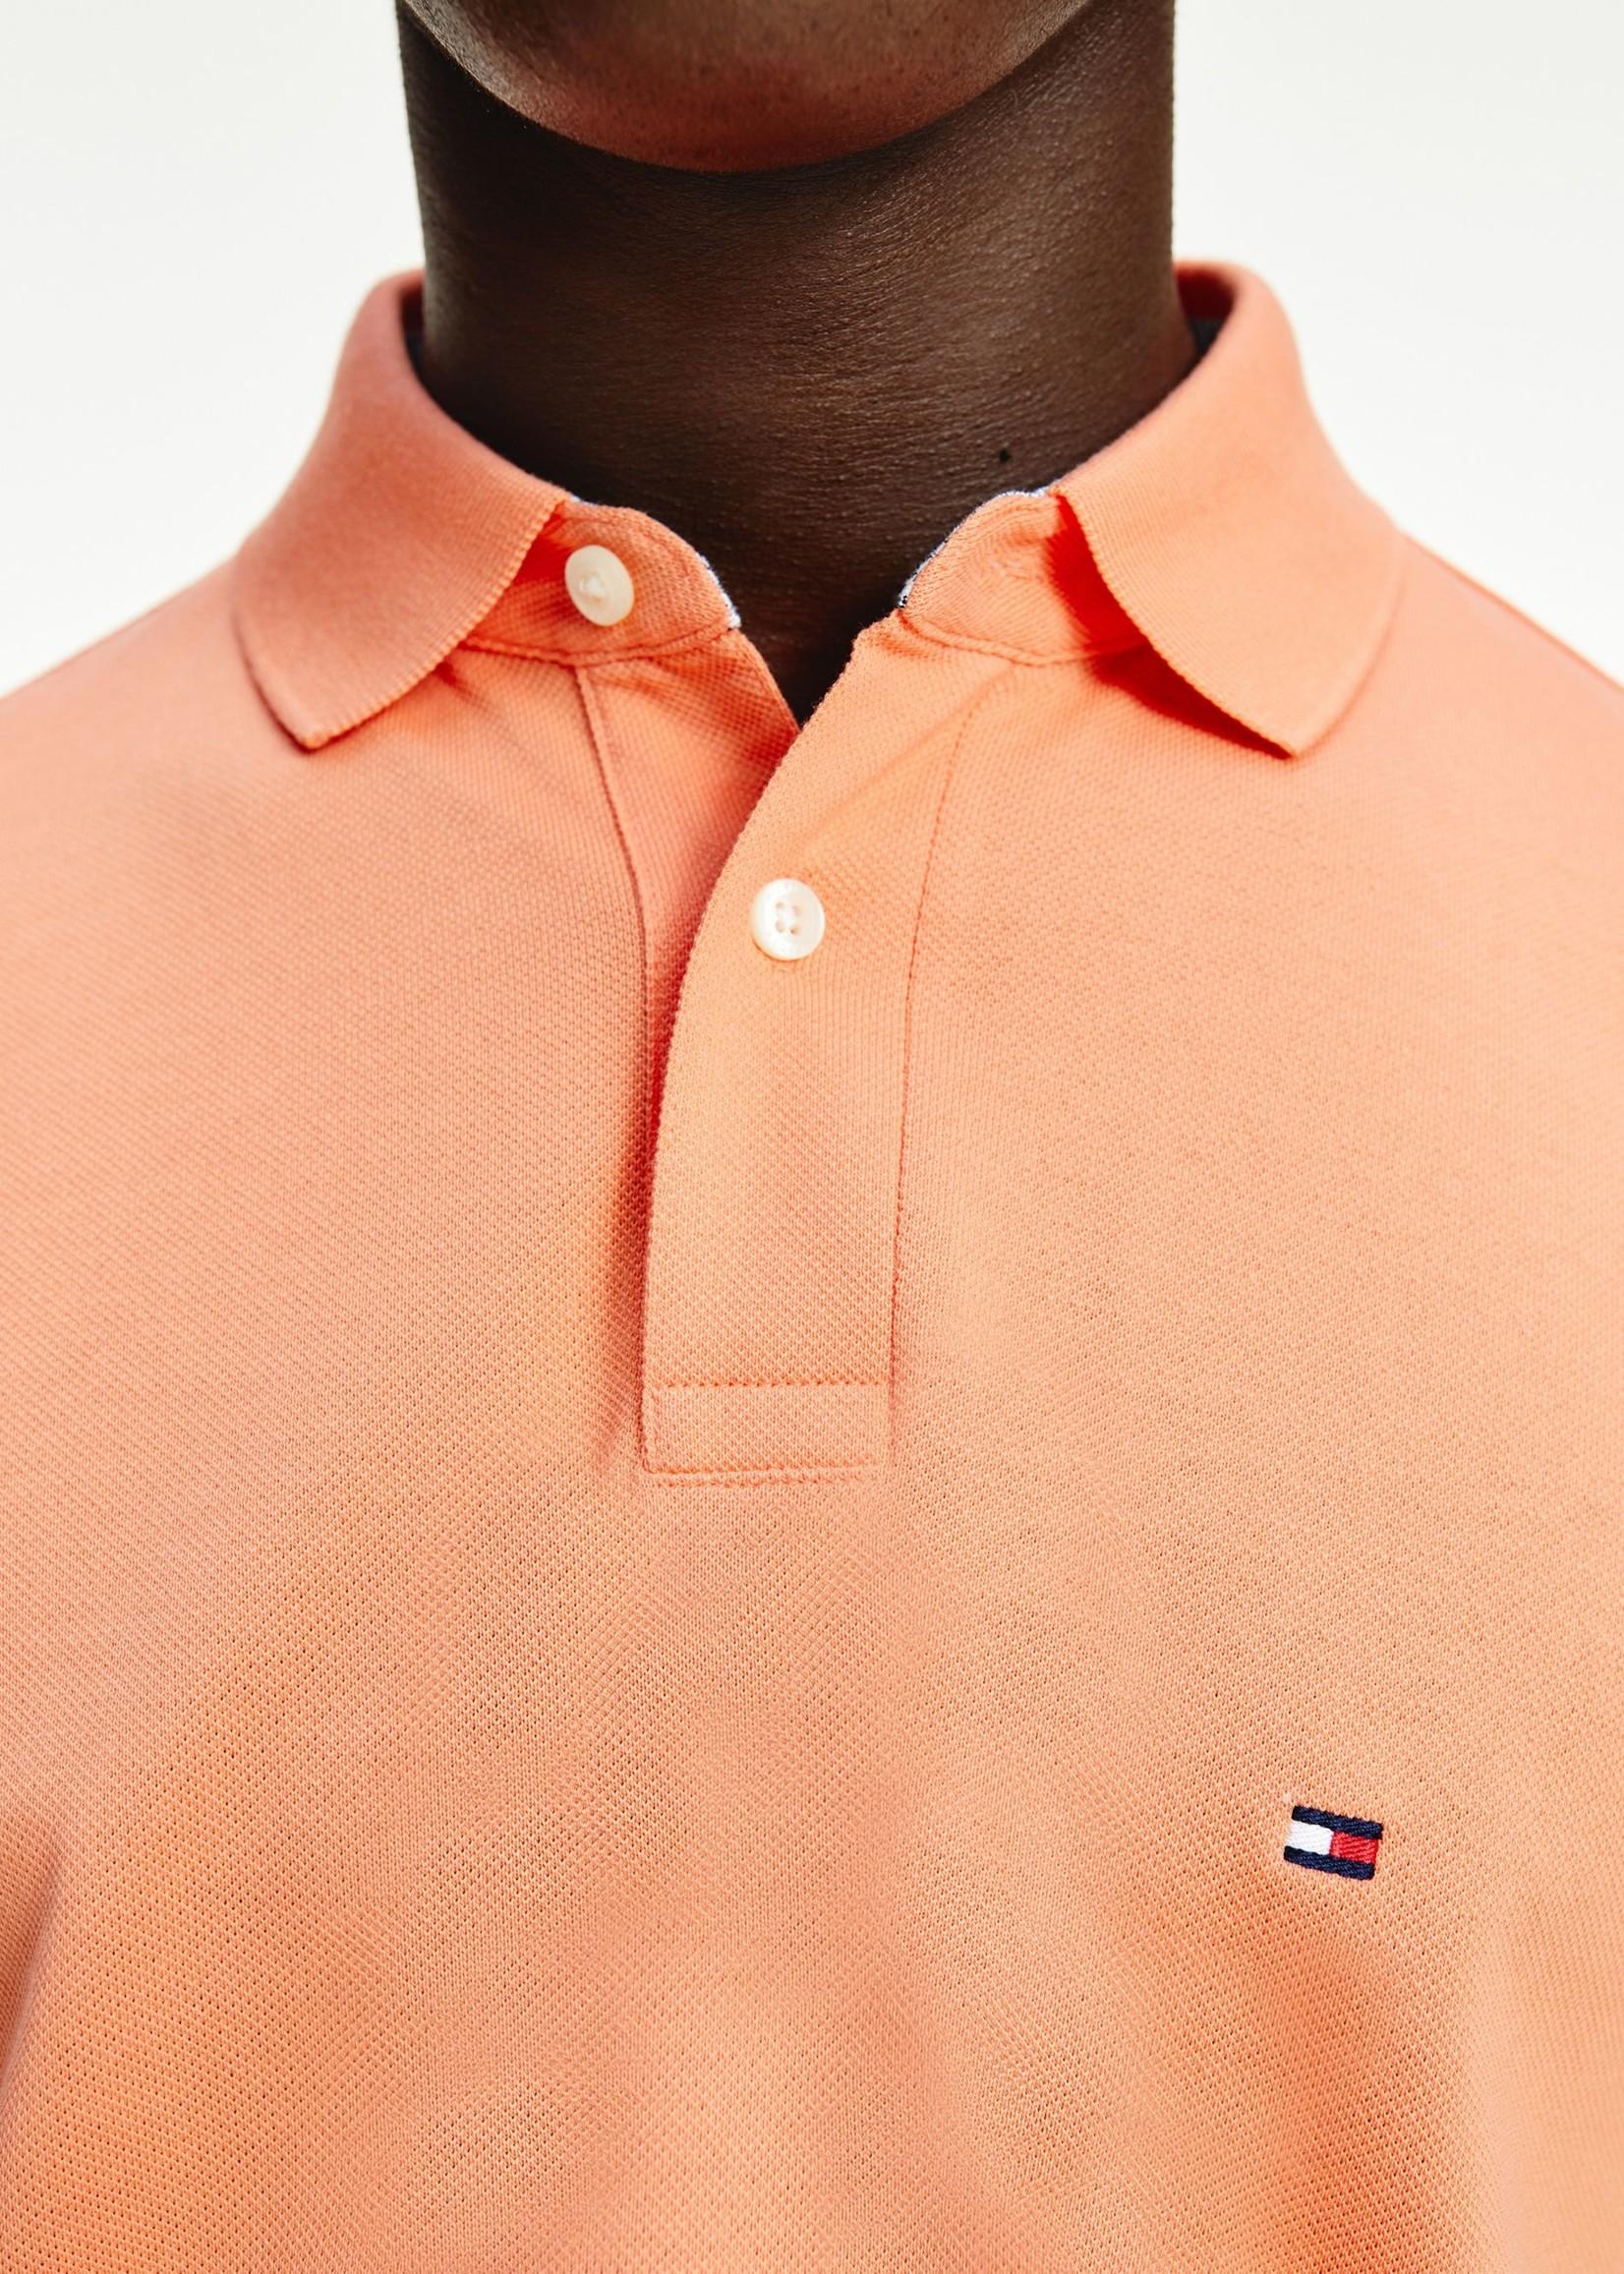 Tommy Hilfiger Polo coupe standard à logo 1985 | Orange | Tommy Hilfiger